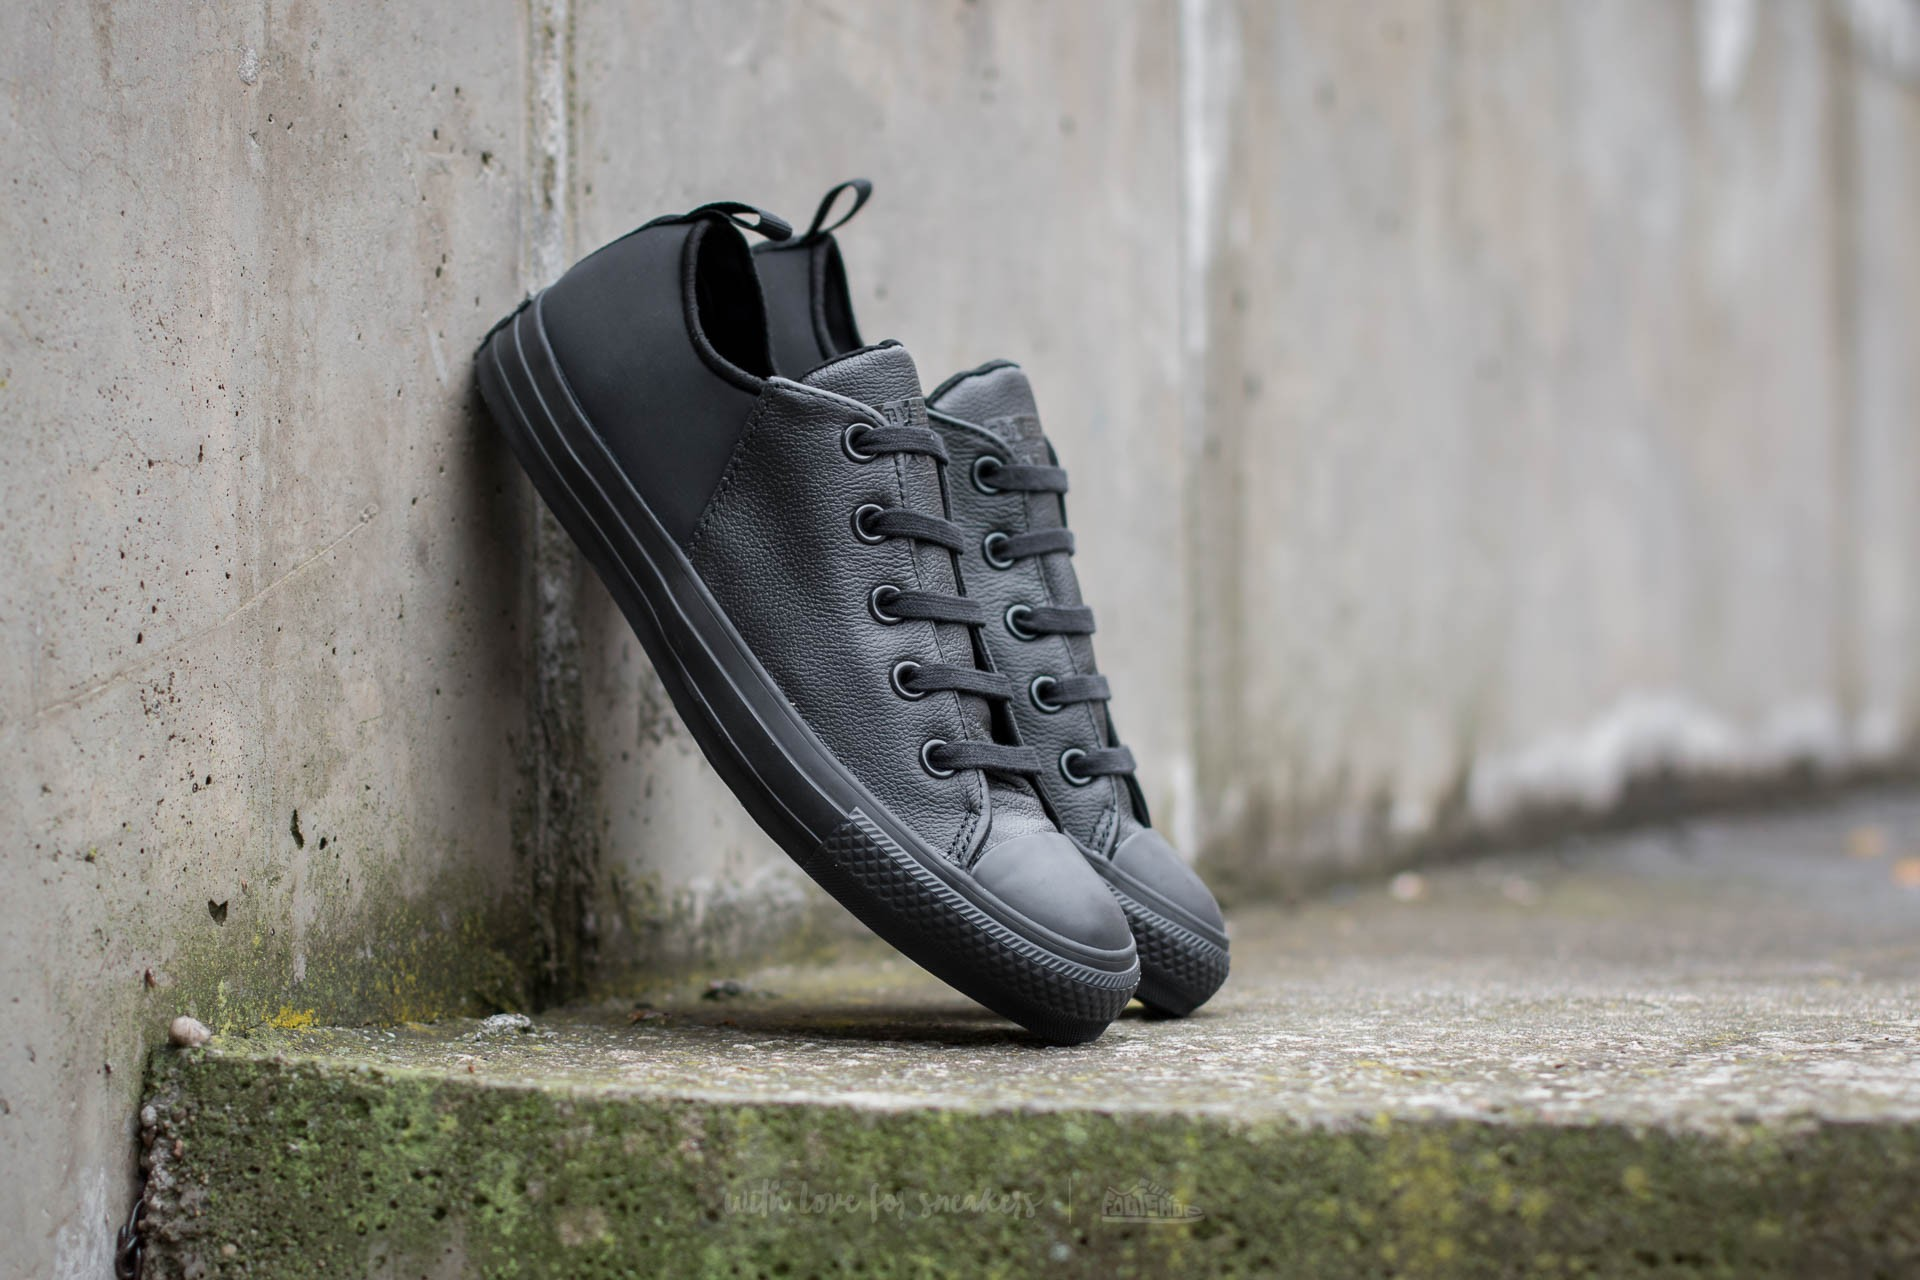 Converse Chuck Taylor All Star Abbey Monochrome Leather Black/ Black/ Black